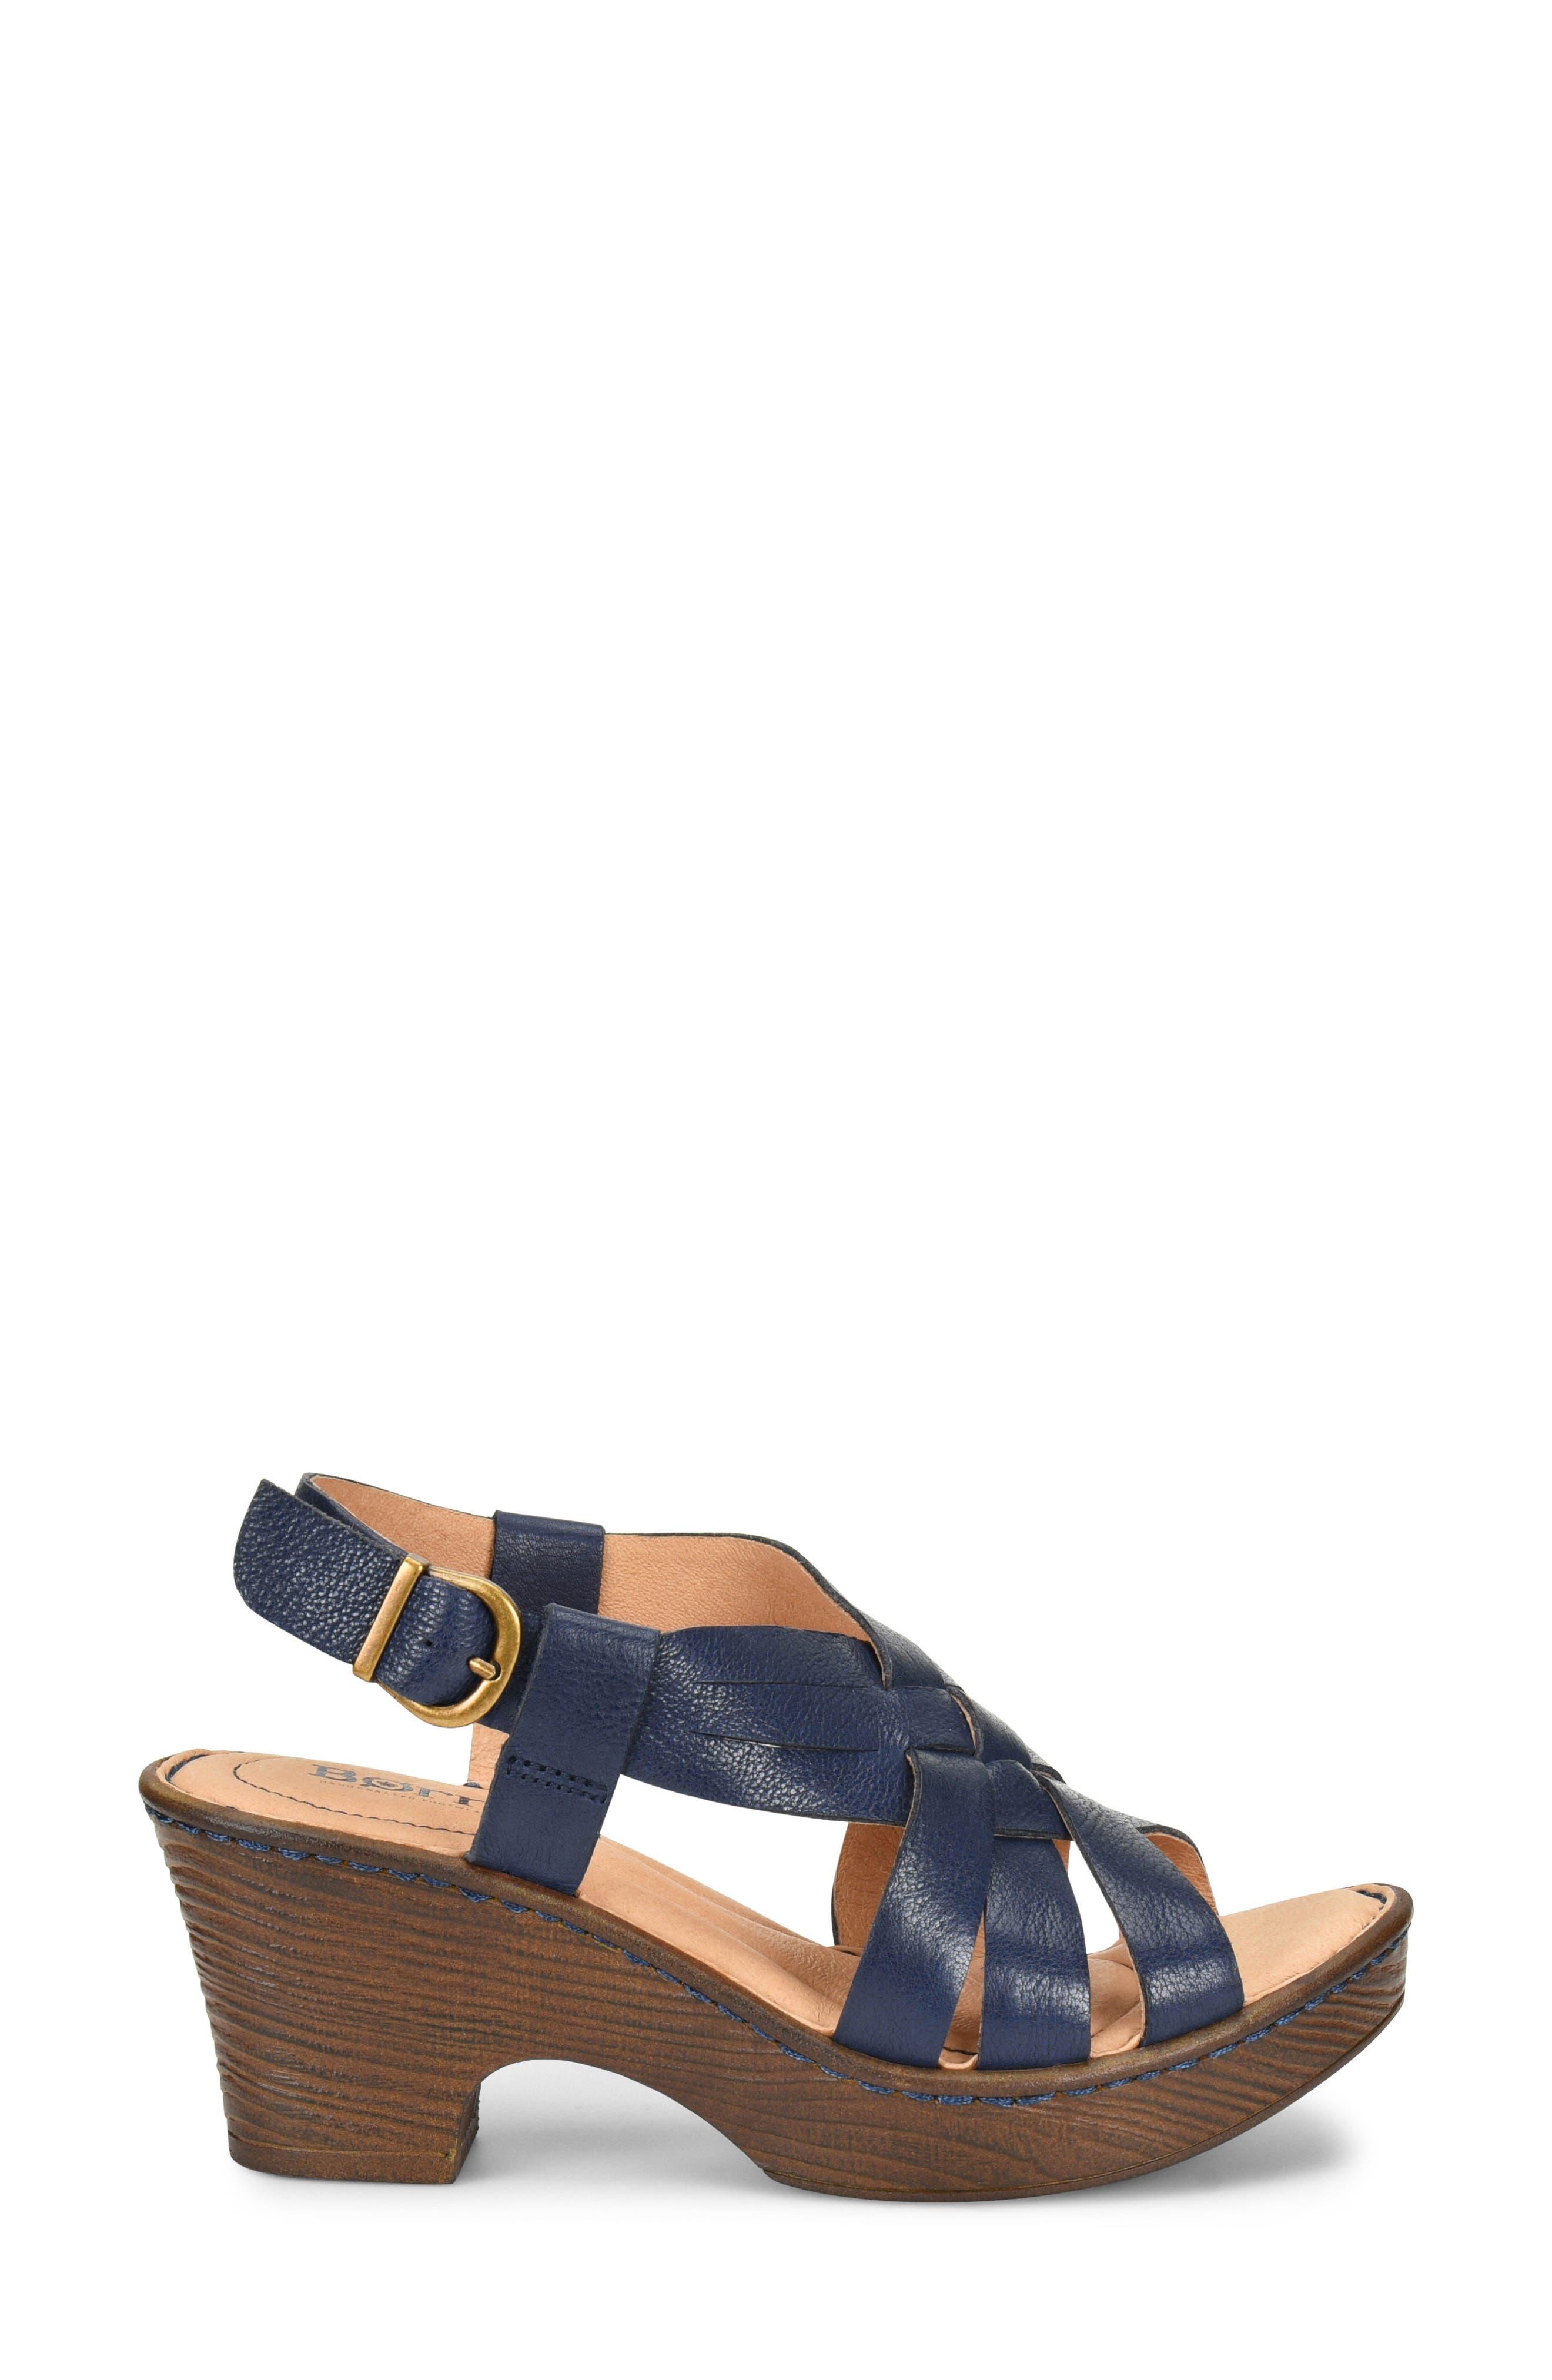 Crevalle Platform Sandal,                             Alternate thumbnail 3, color,                             Navy Leather